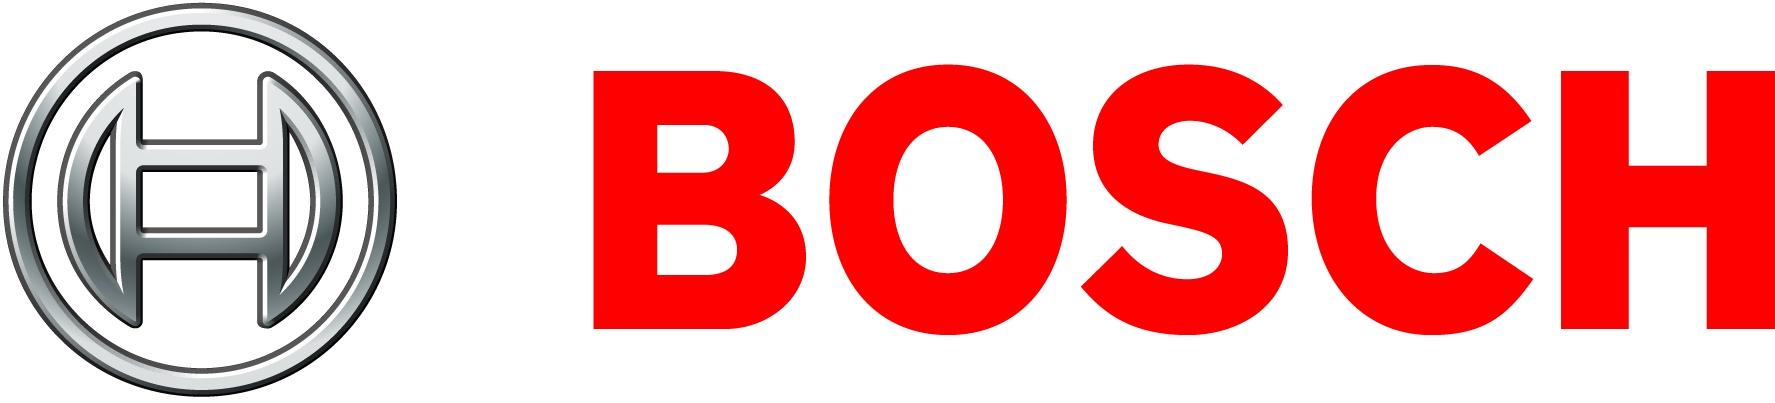 Bosch_RGB_S